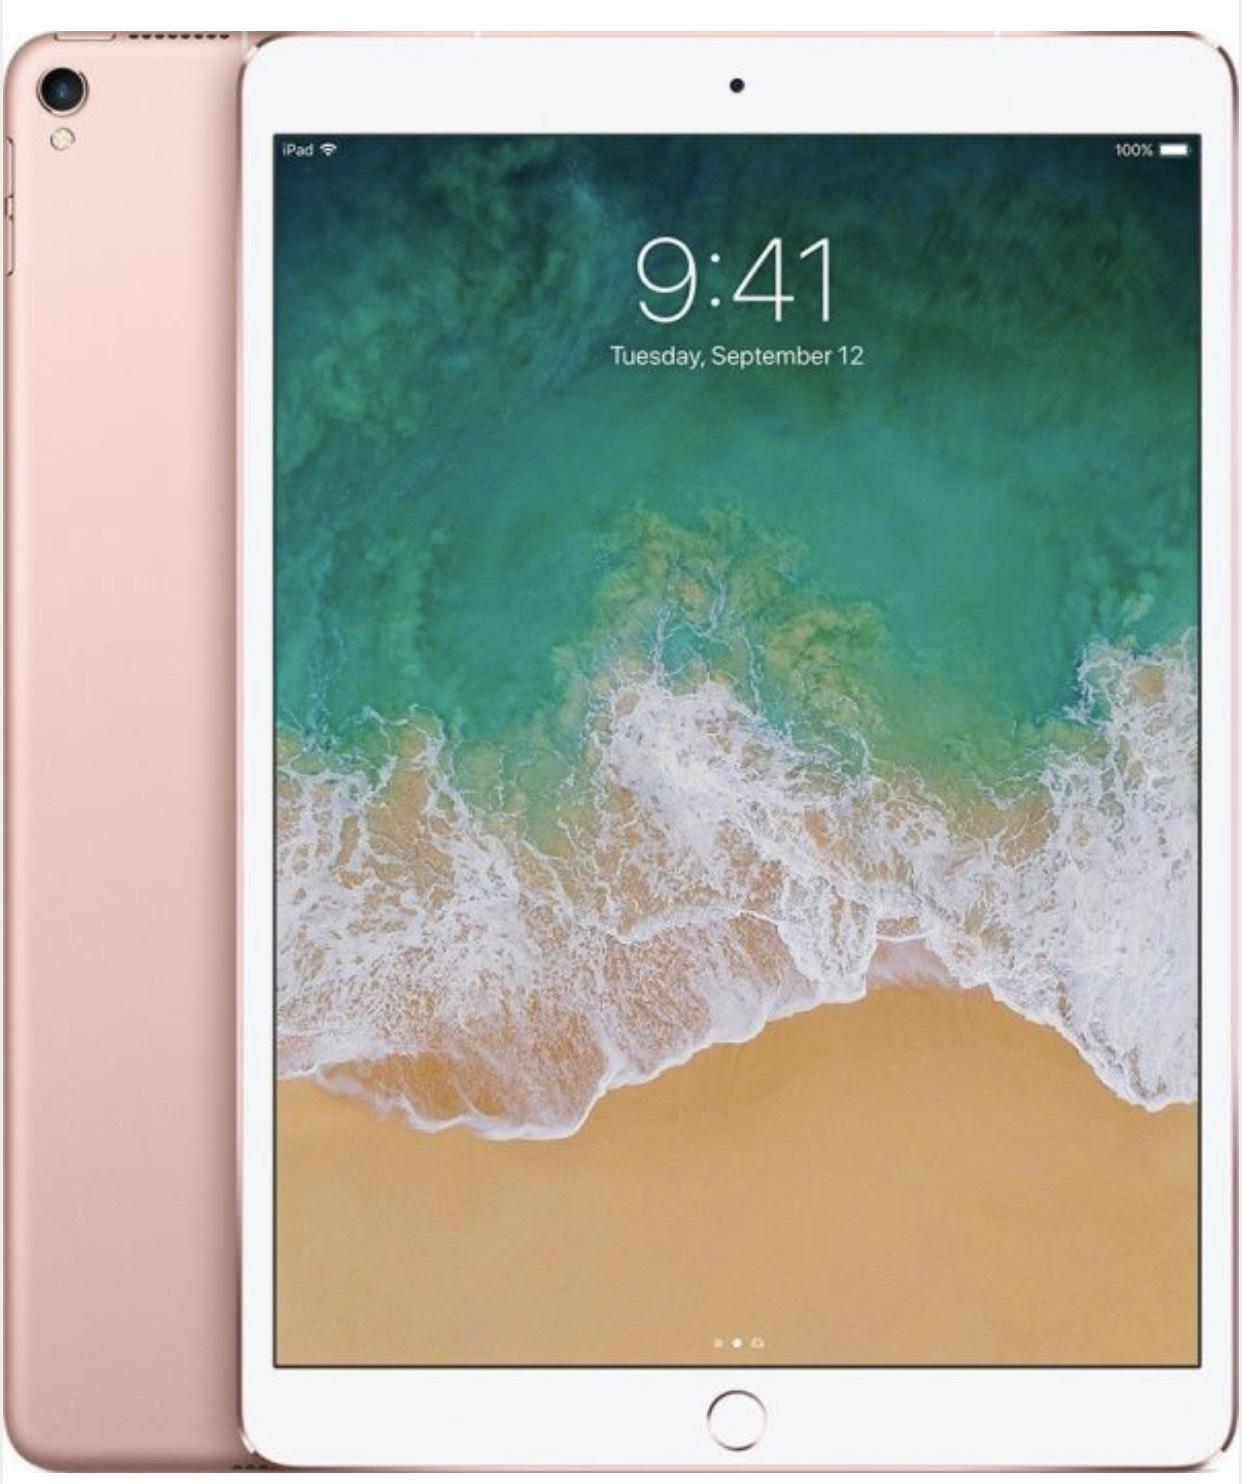 Apple Ipad Pro 10.5 Rosegold Wifi + Cellular 64GB für 555€ inklusive Logoix